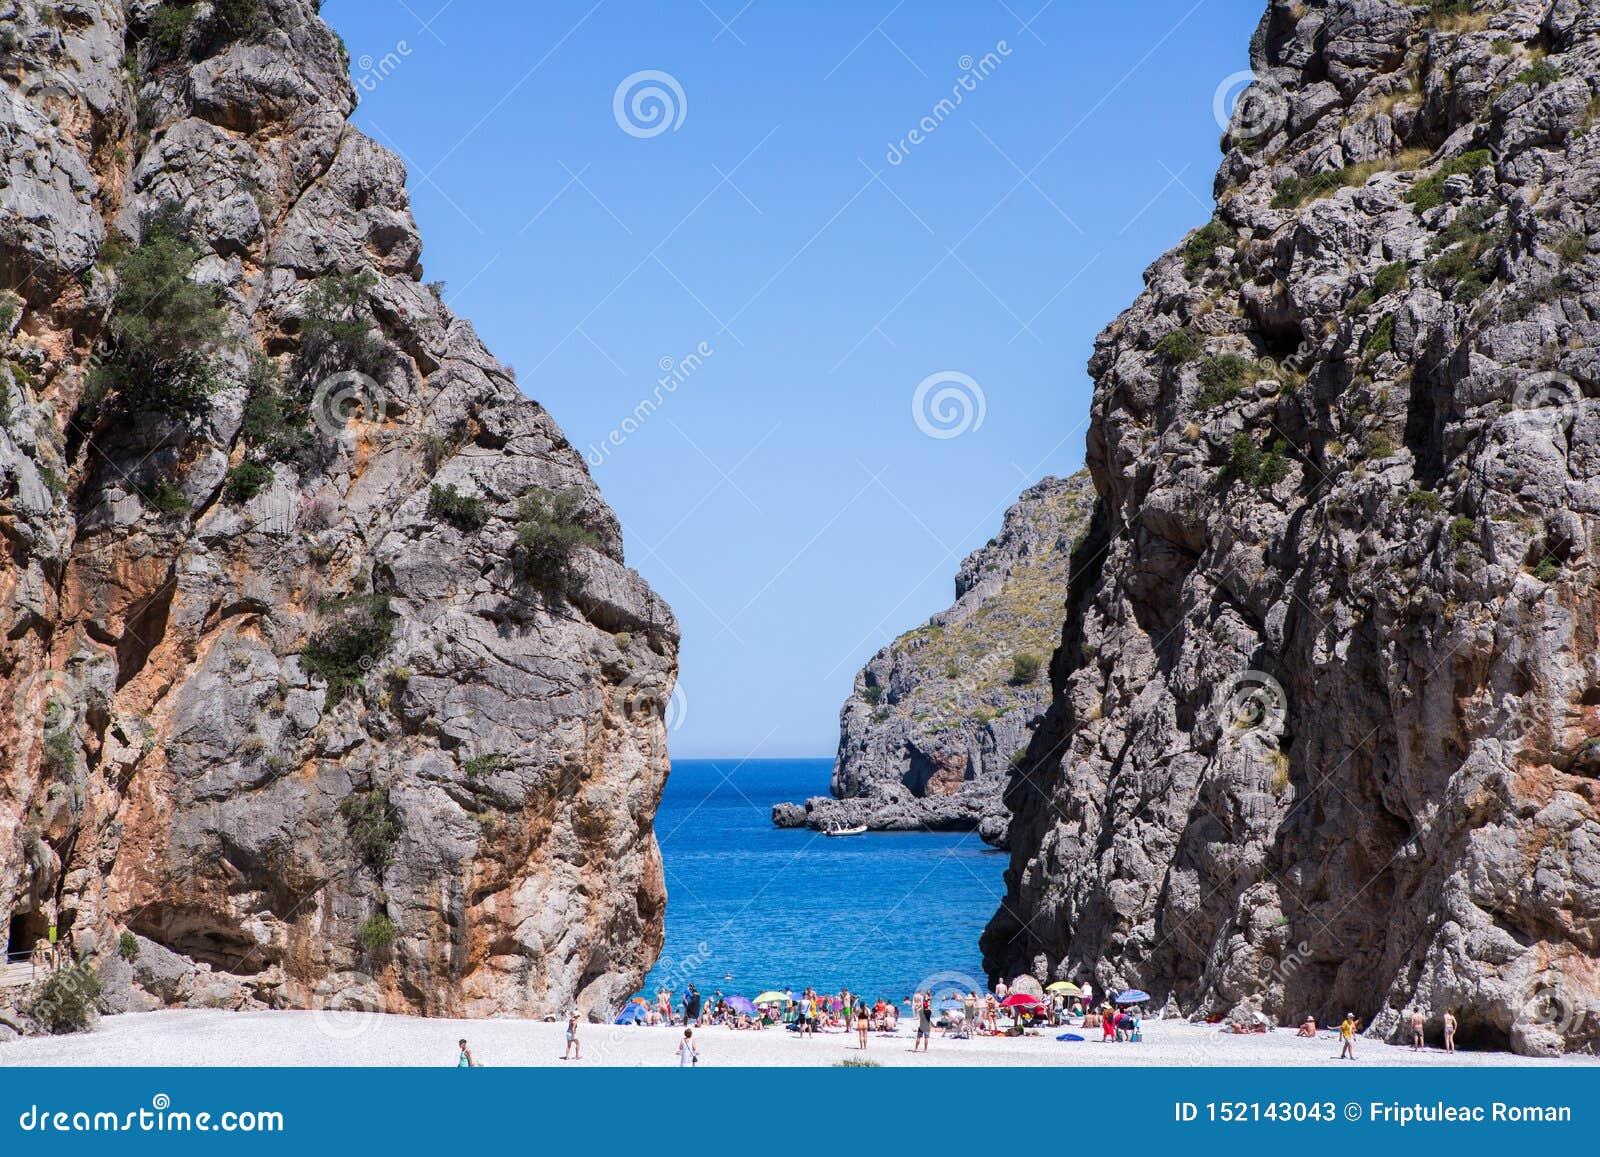 Potok De pareis Sa Calobra Mallorca, Hiszpania Pięknej zatoki plaży turkusowe denne góry, Cala Sa Calobra